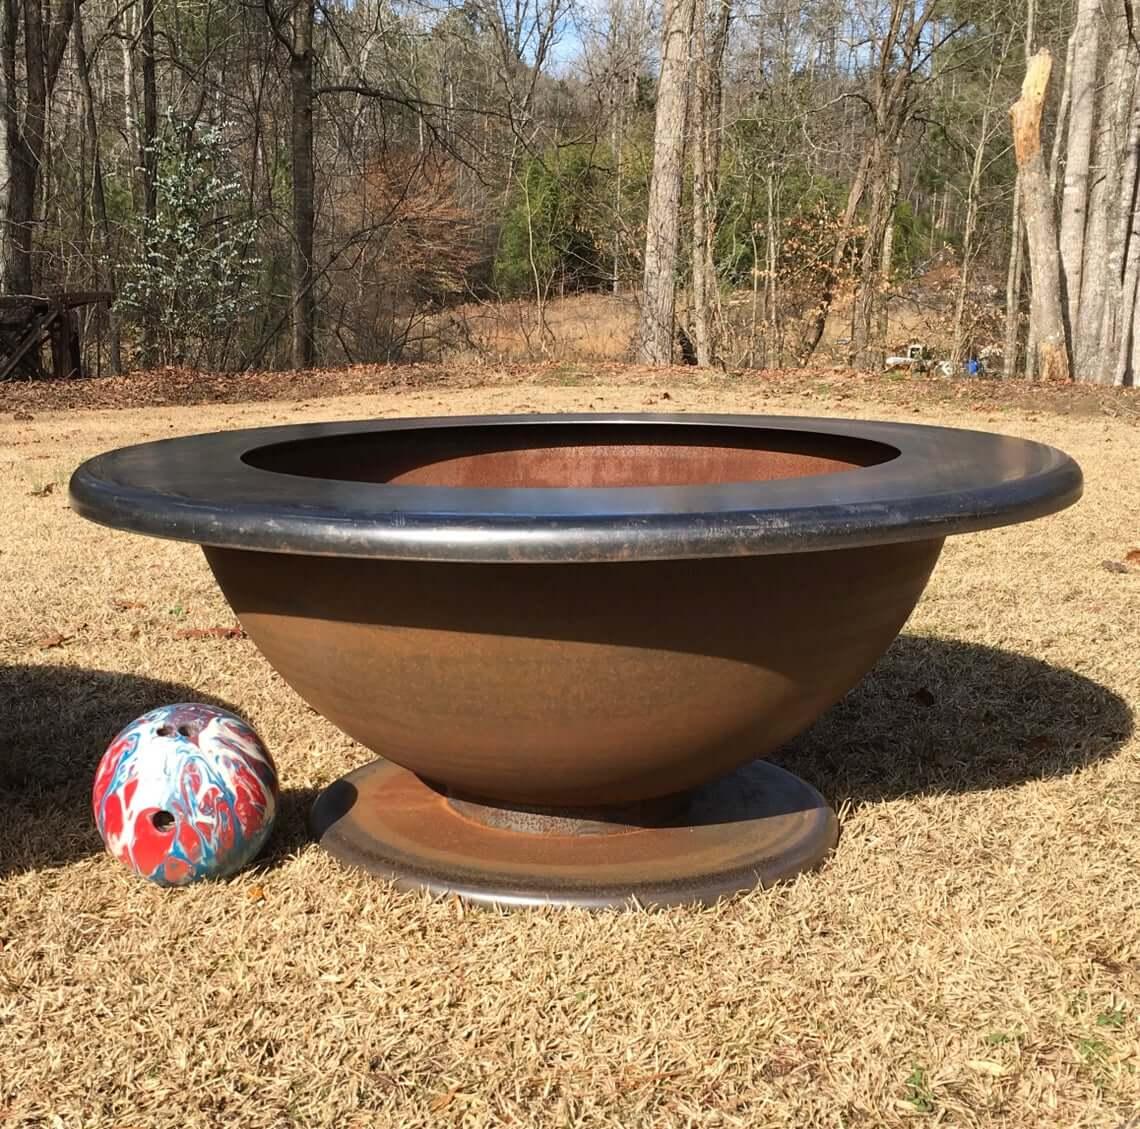 29 Best Metal Fire Pit Ideas to Modernize your Backyard in ... on Best Fire Pit Design id=91247